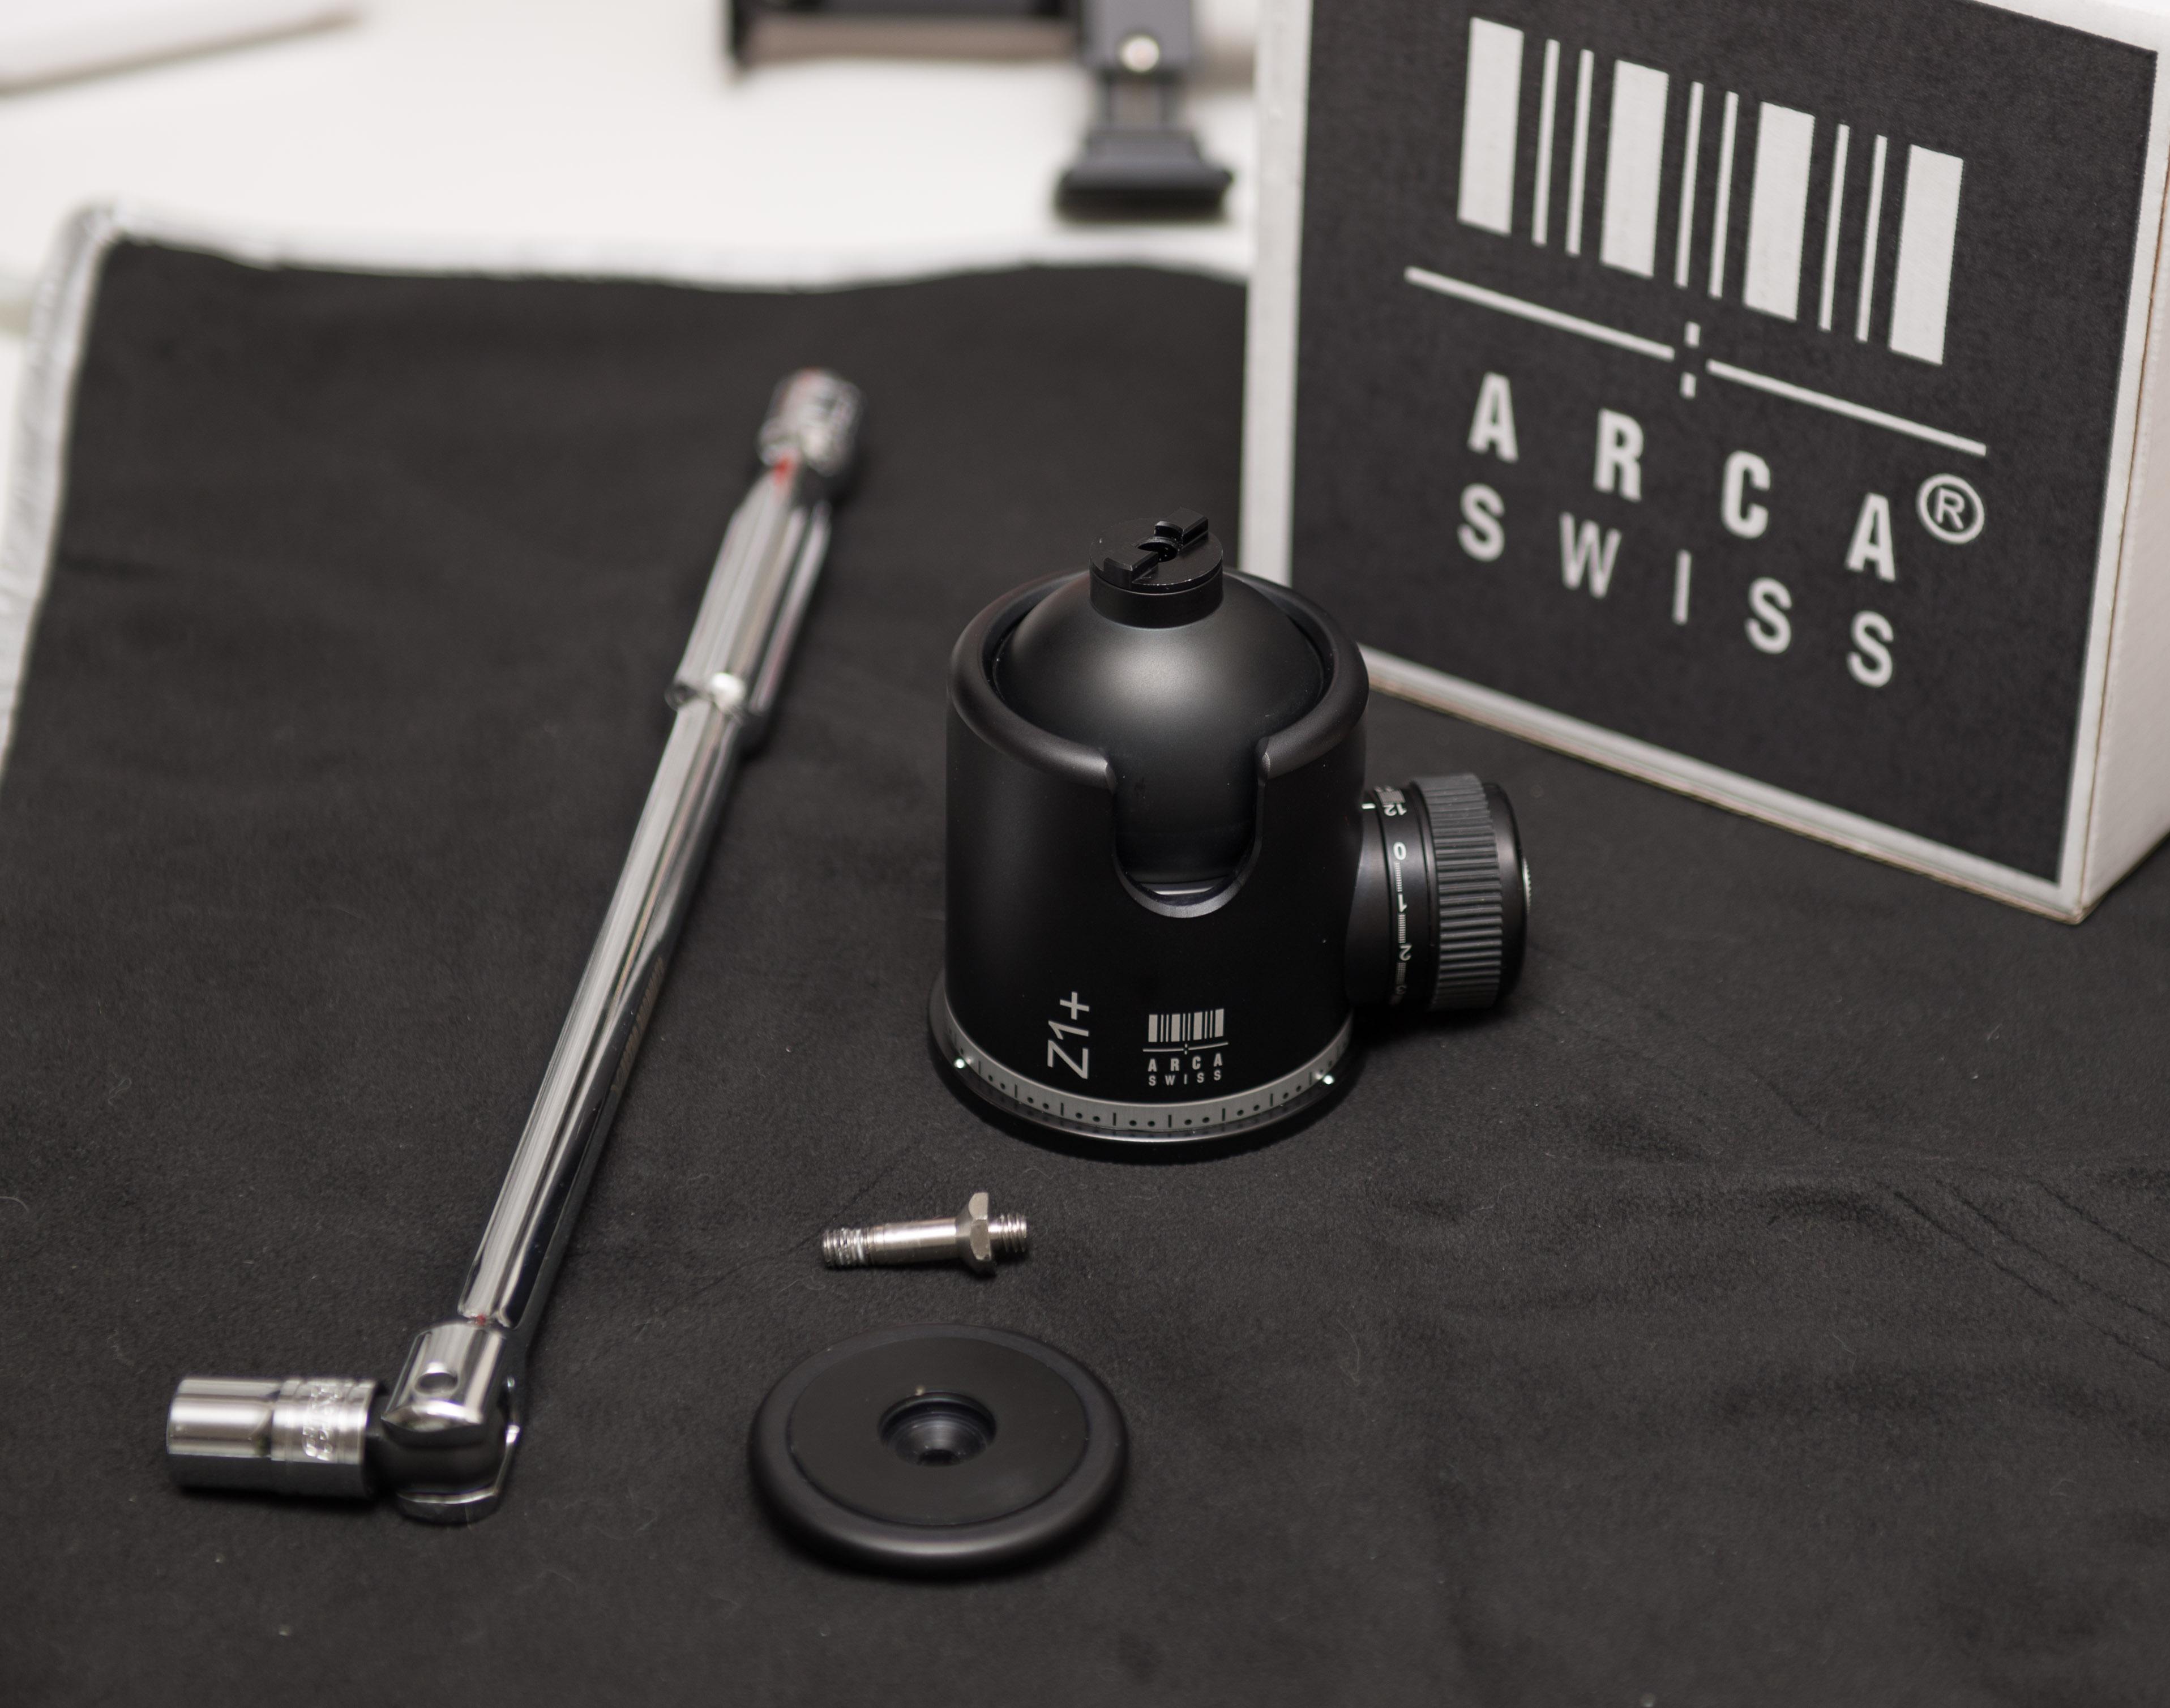 arcaswiss-Z1+ arcaswiss screw ネジ ボルト 六角穴付き 低頭 純正 固い ナメた 舐めた 工具 KTC ネプロス Z1